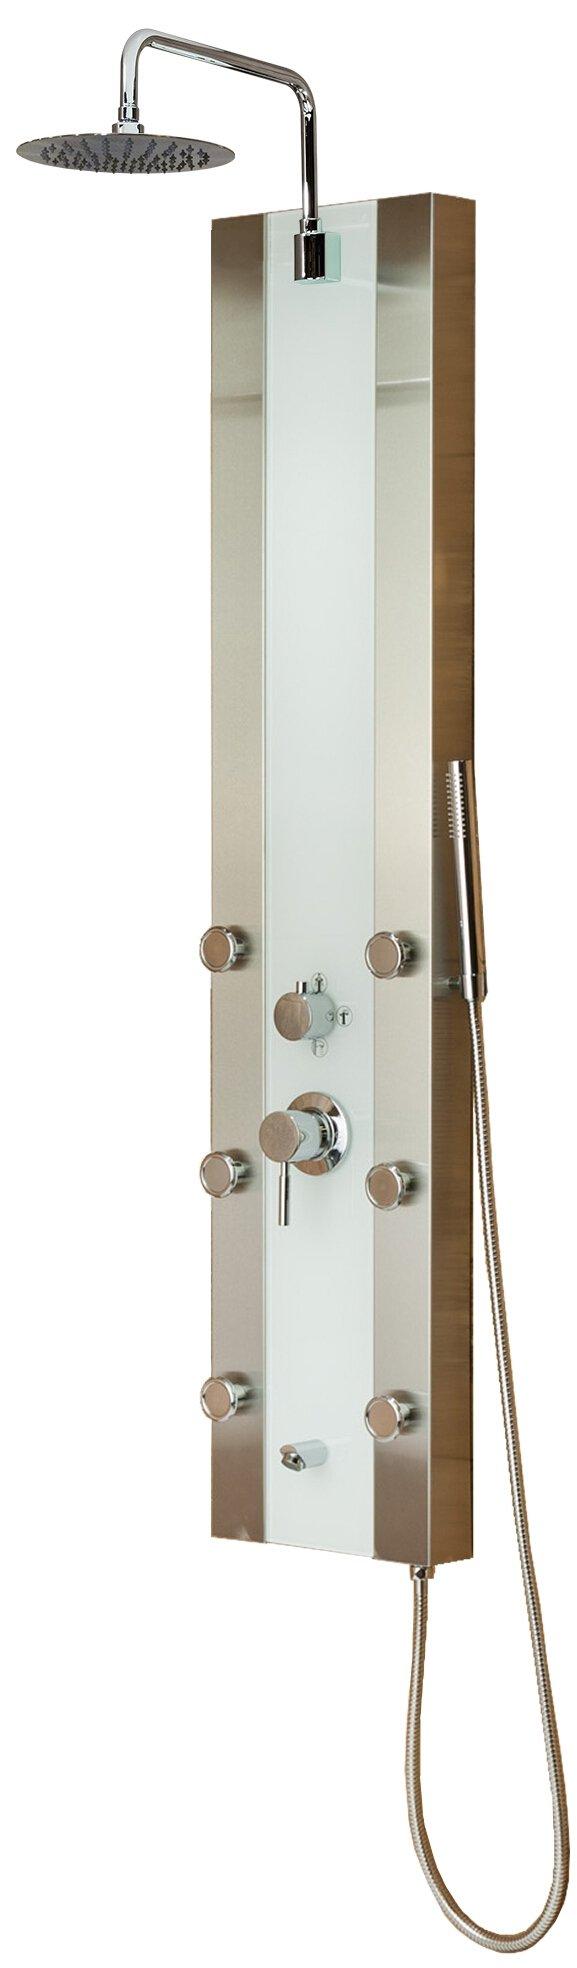 Pulse 1039W-BN Tropicana Shower Spa, Brushed Nickel